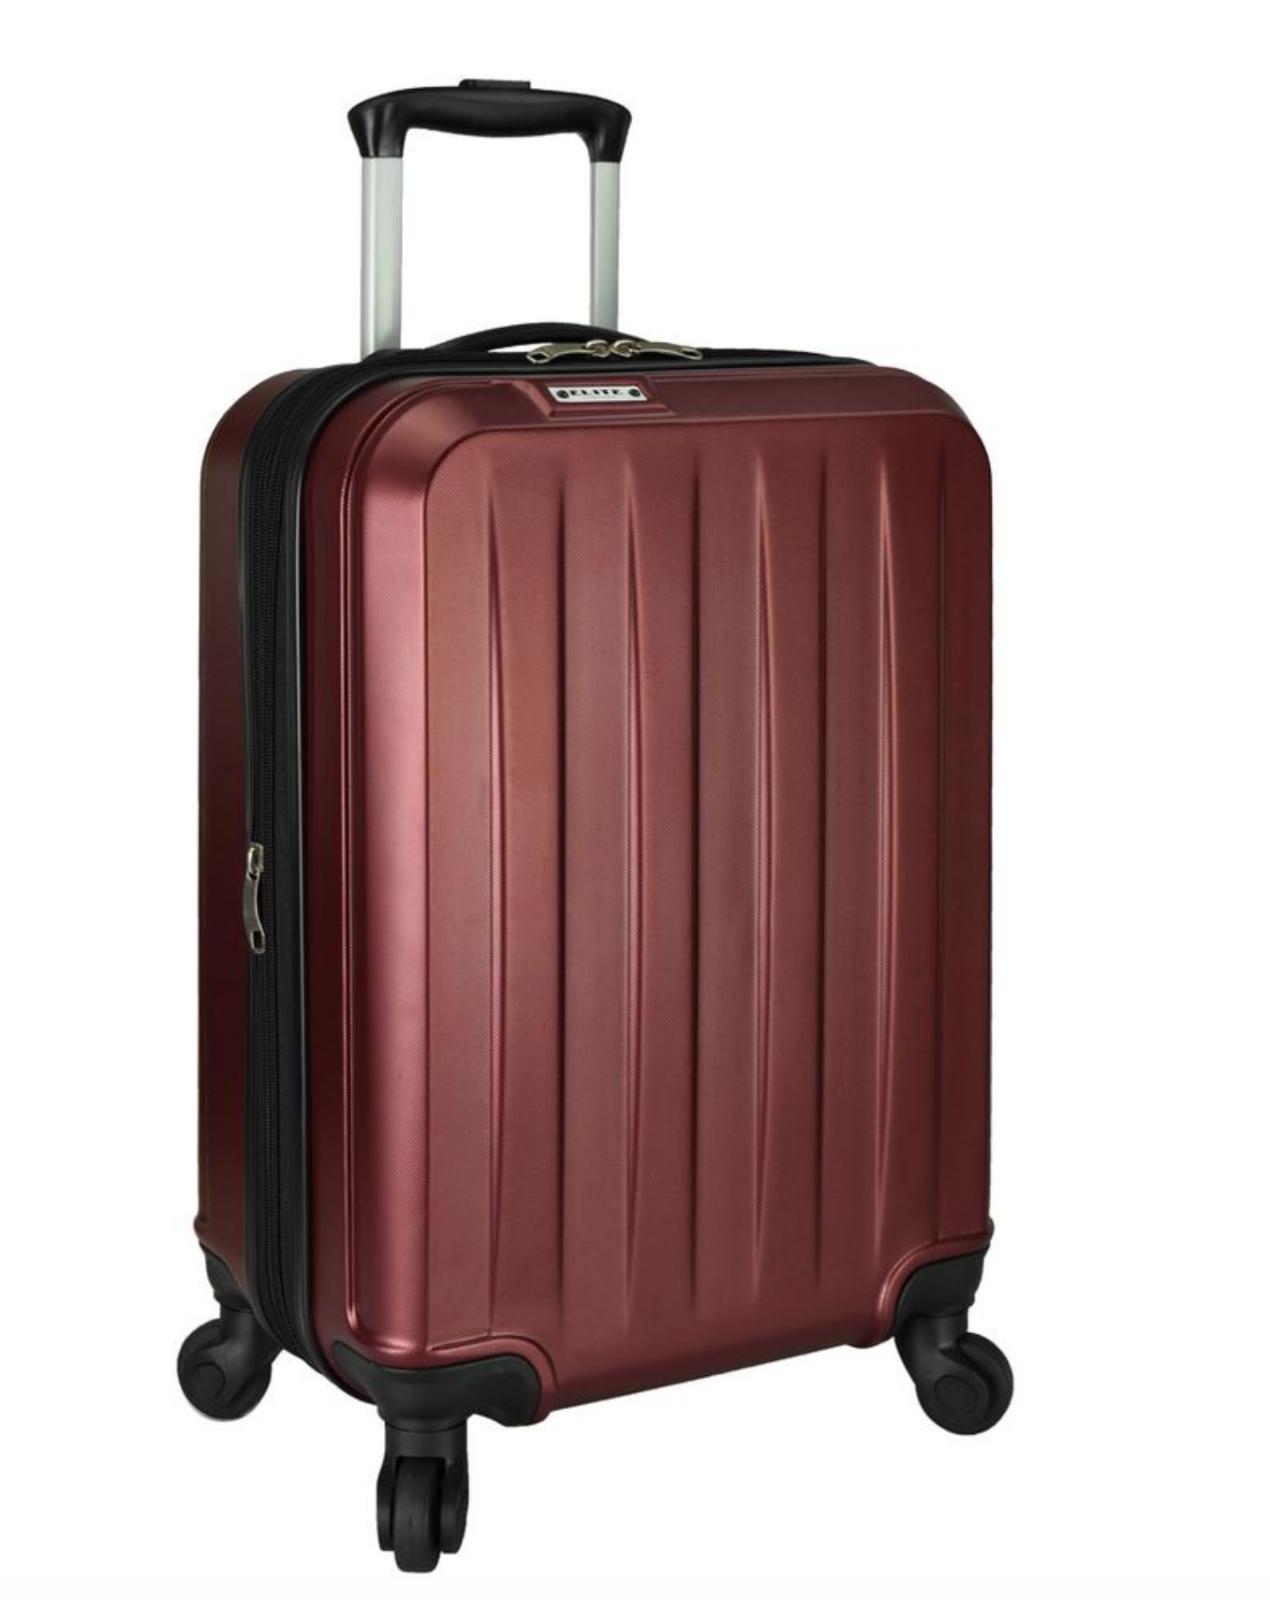 Elite Dori Expandable Carry-On Spinner Luggage, Burgundy By Elite Luggage - $39.99